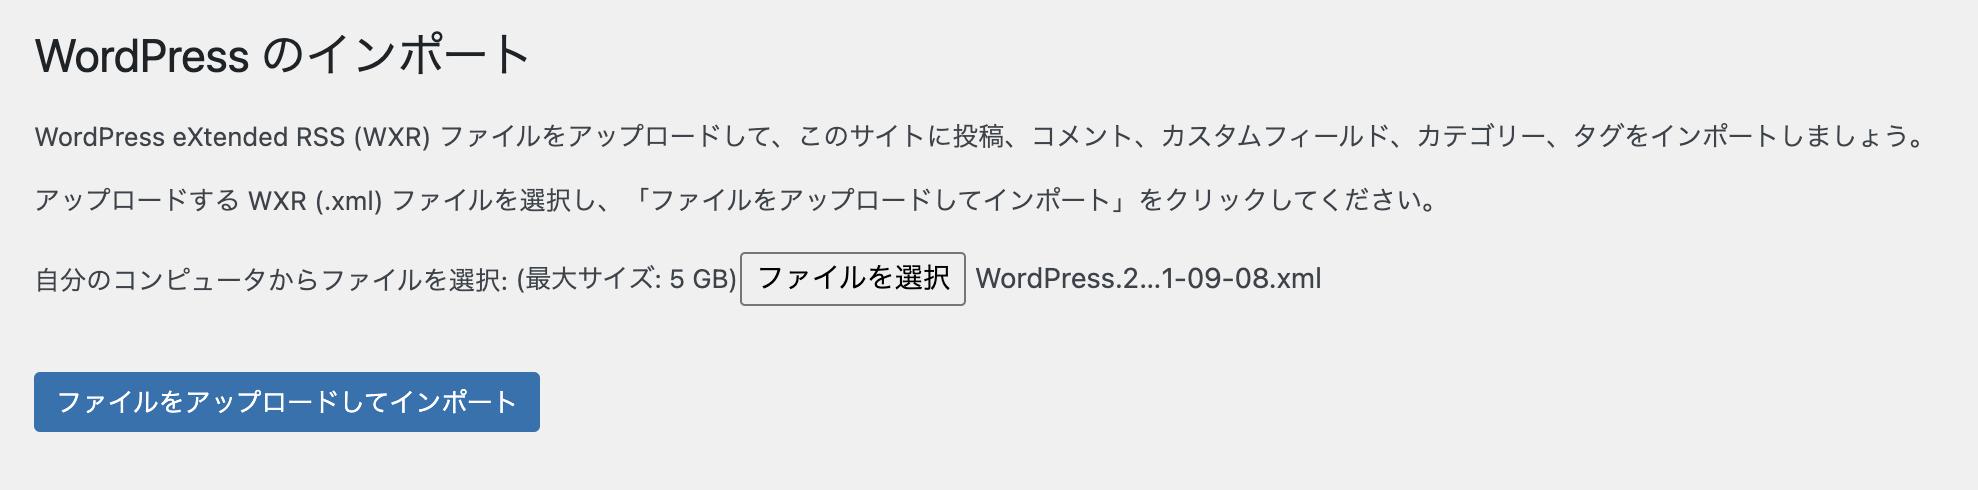 docker wordpress xml import